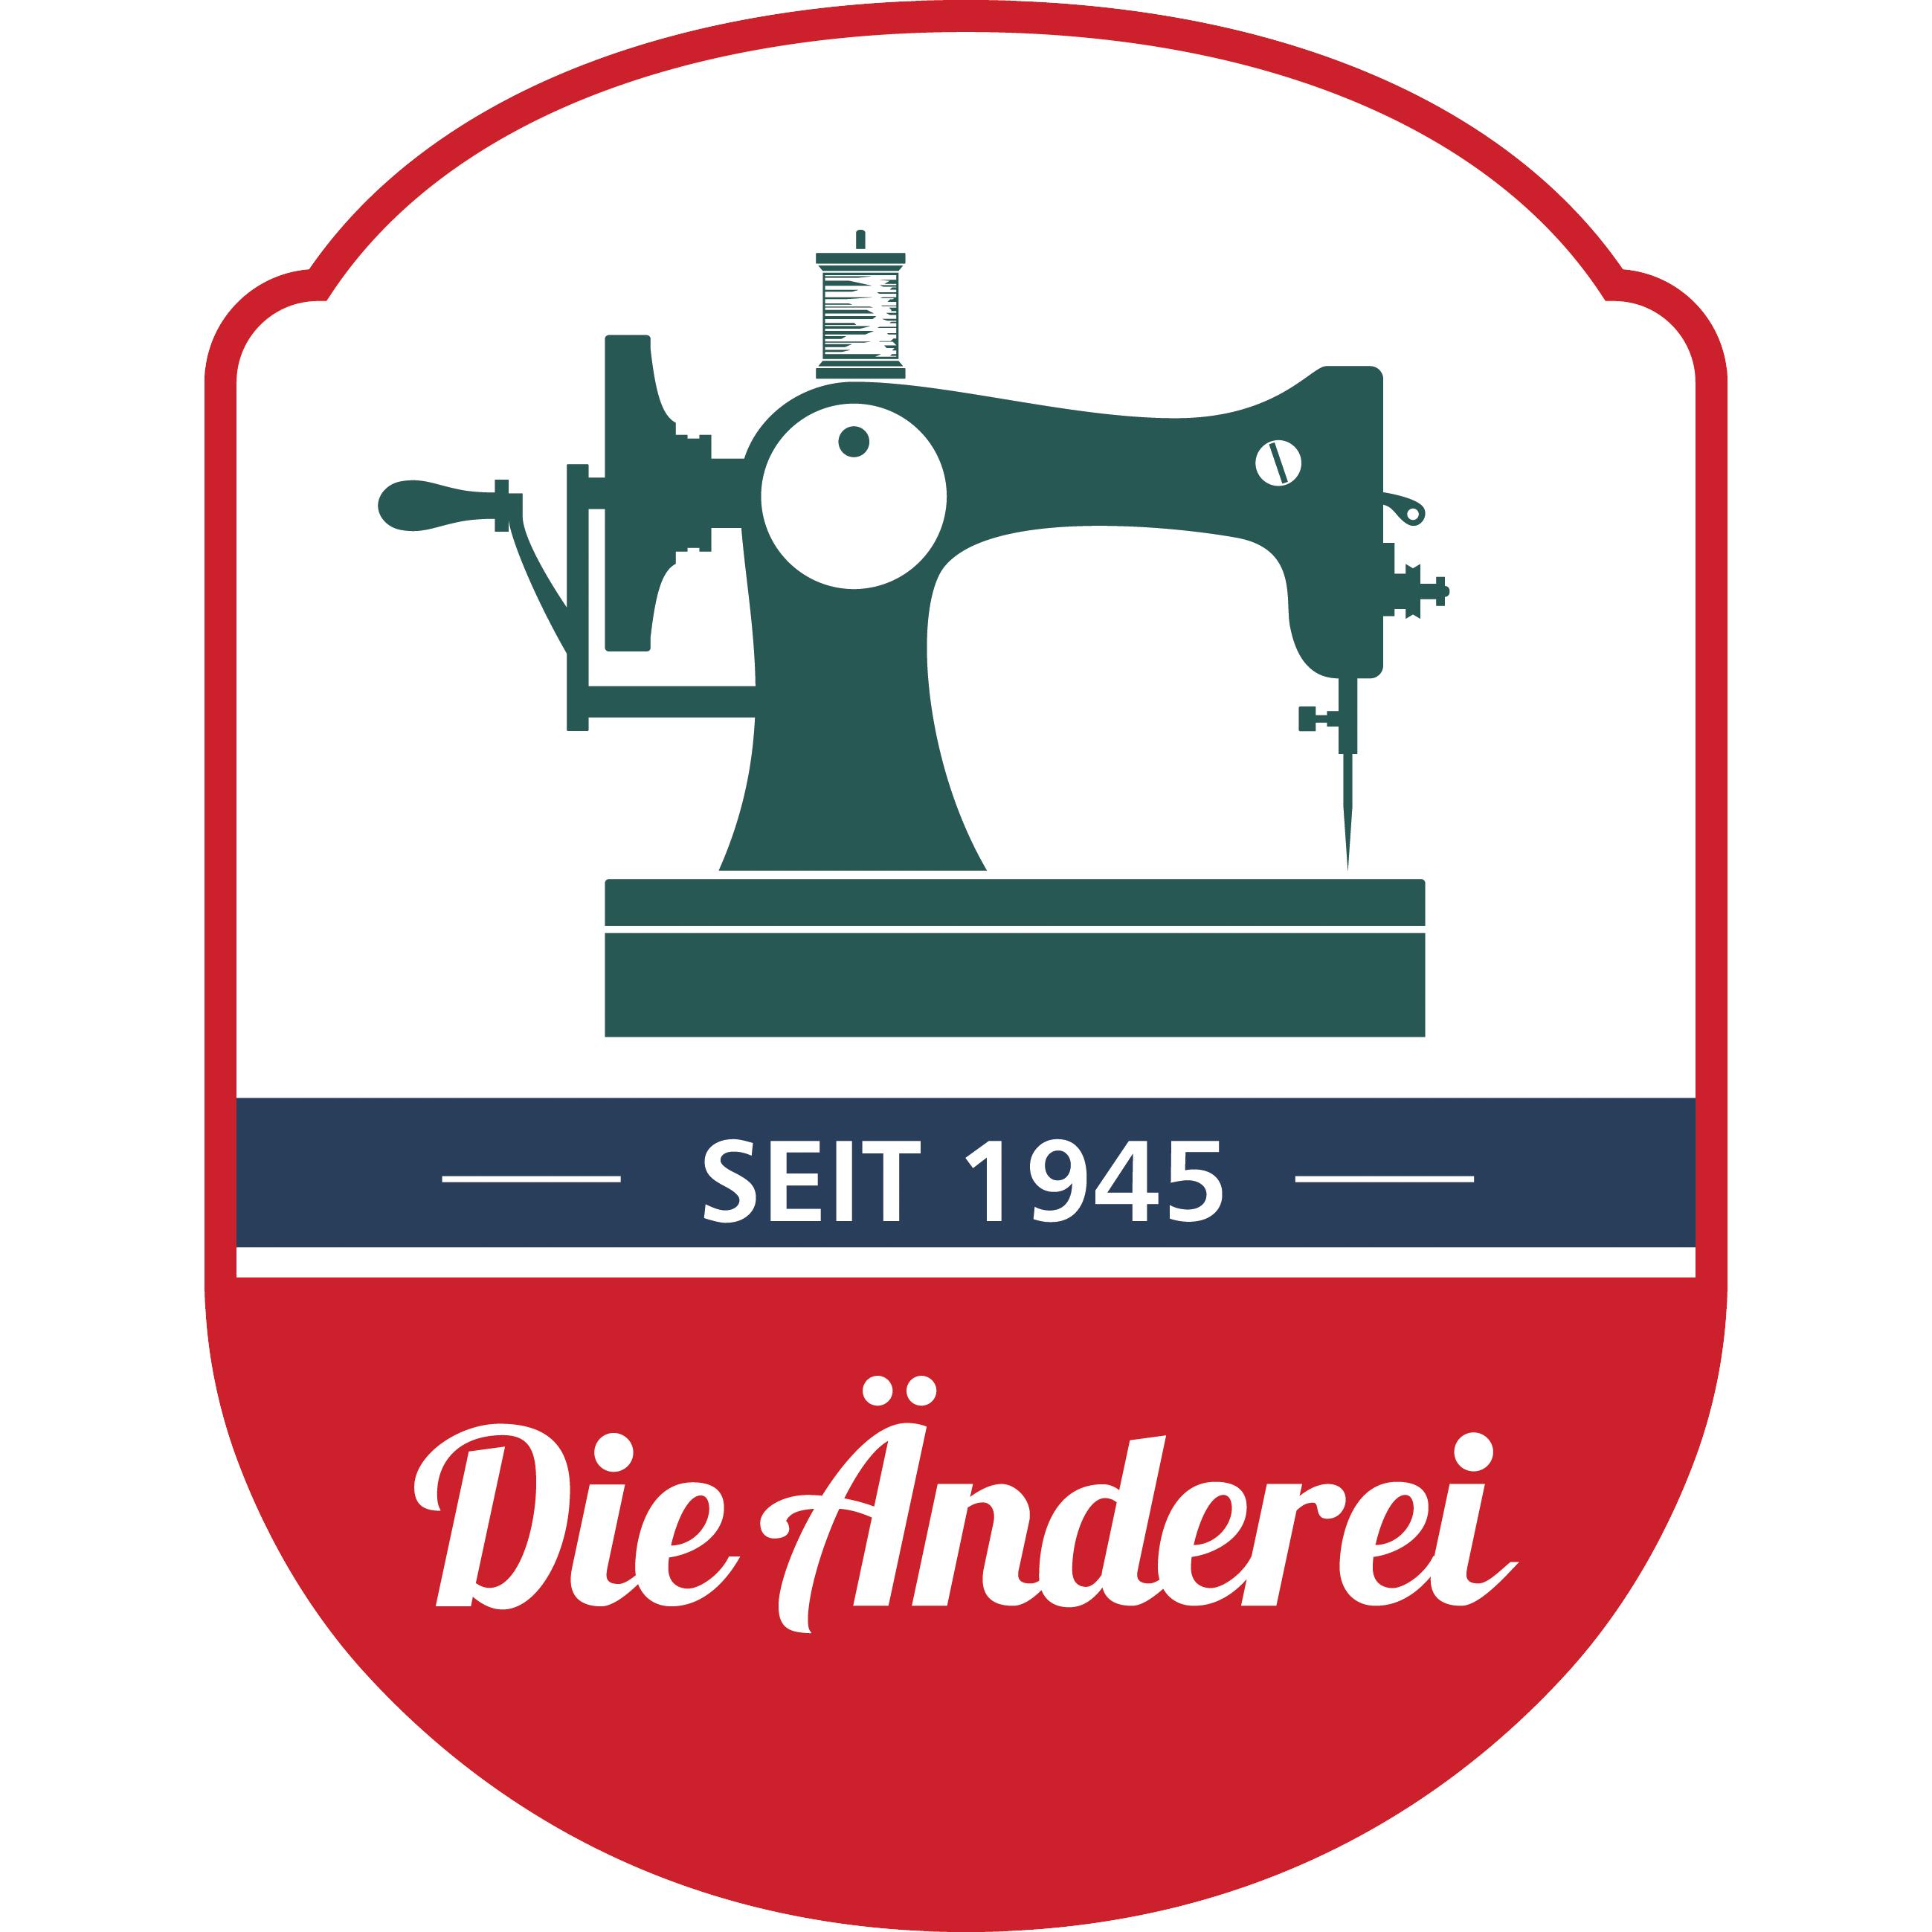 DIE ÄNDEREI - Schneiderei & Kunststopferei